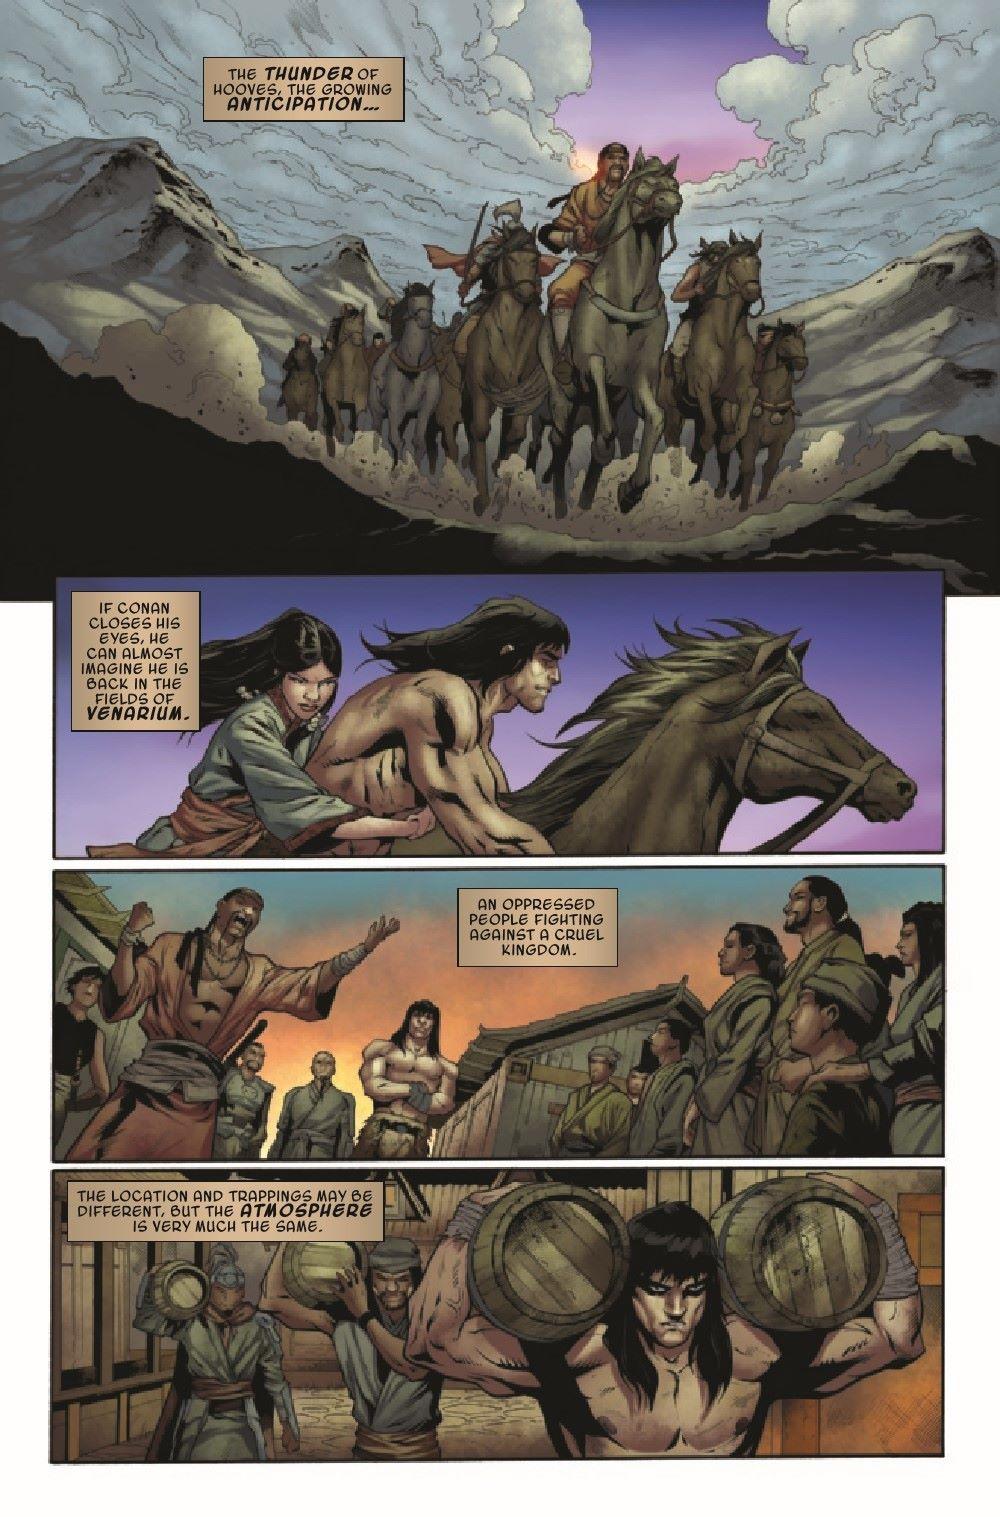 CONANBARB2019021_Preview-3 ComicList Previews: CONAN THE BARBARIAN #21